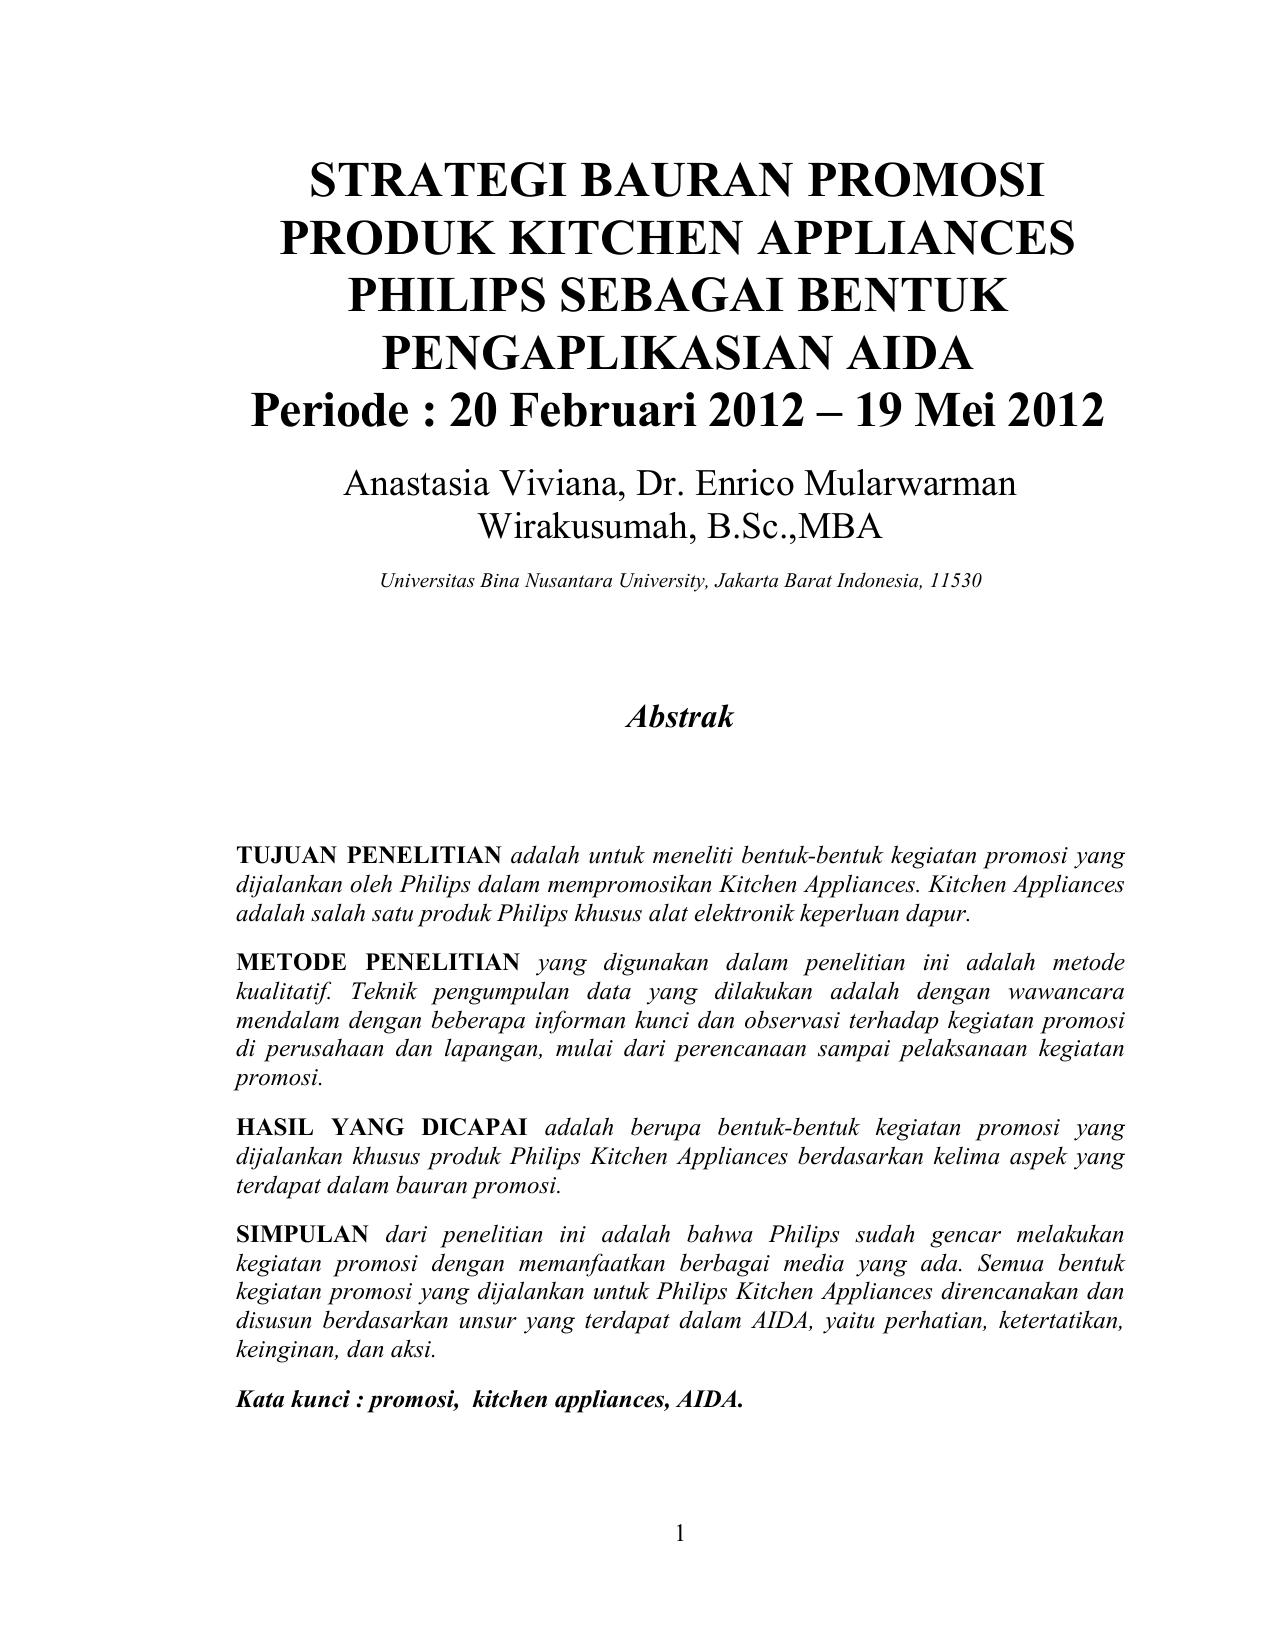 Strategi Bauran Promosi Produk Kitchen Appliances